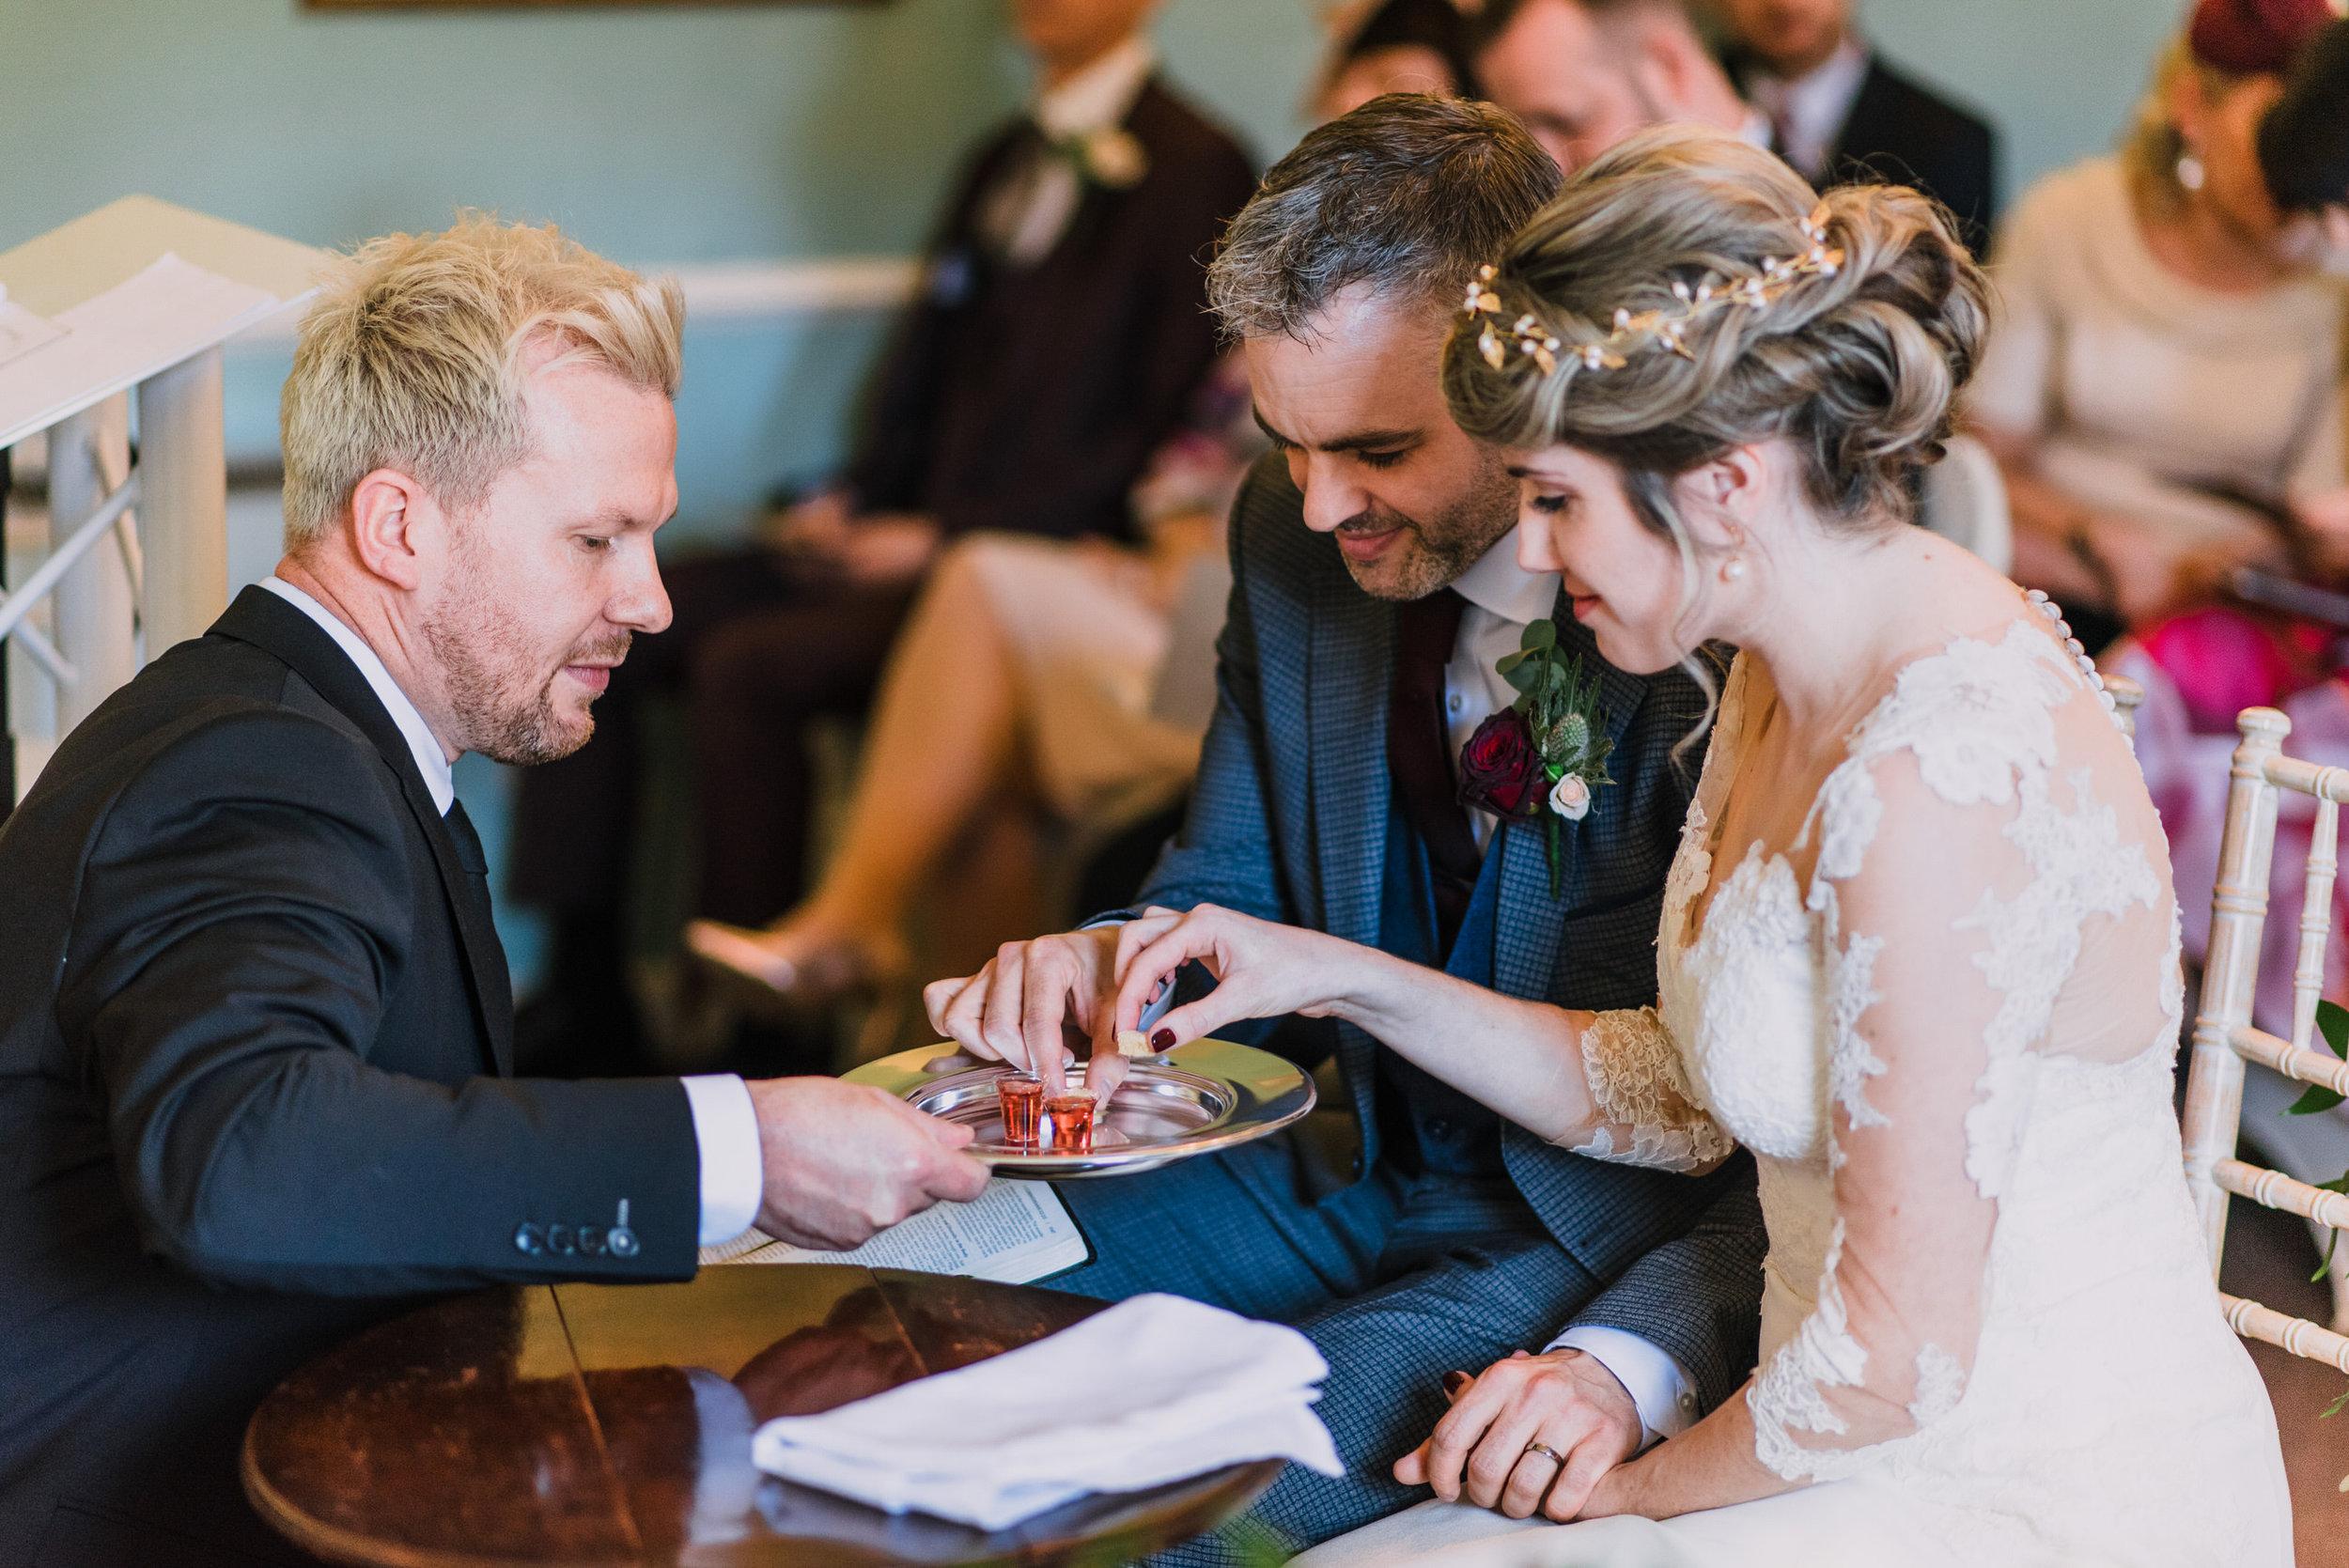 lissanoure castle wedding, northern ireland wedding photographer, romantic northern irish wedding venue, castle wedding ireland, natural wedding photography ni (60).jpg